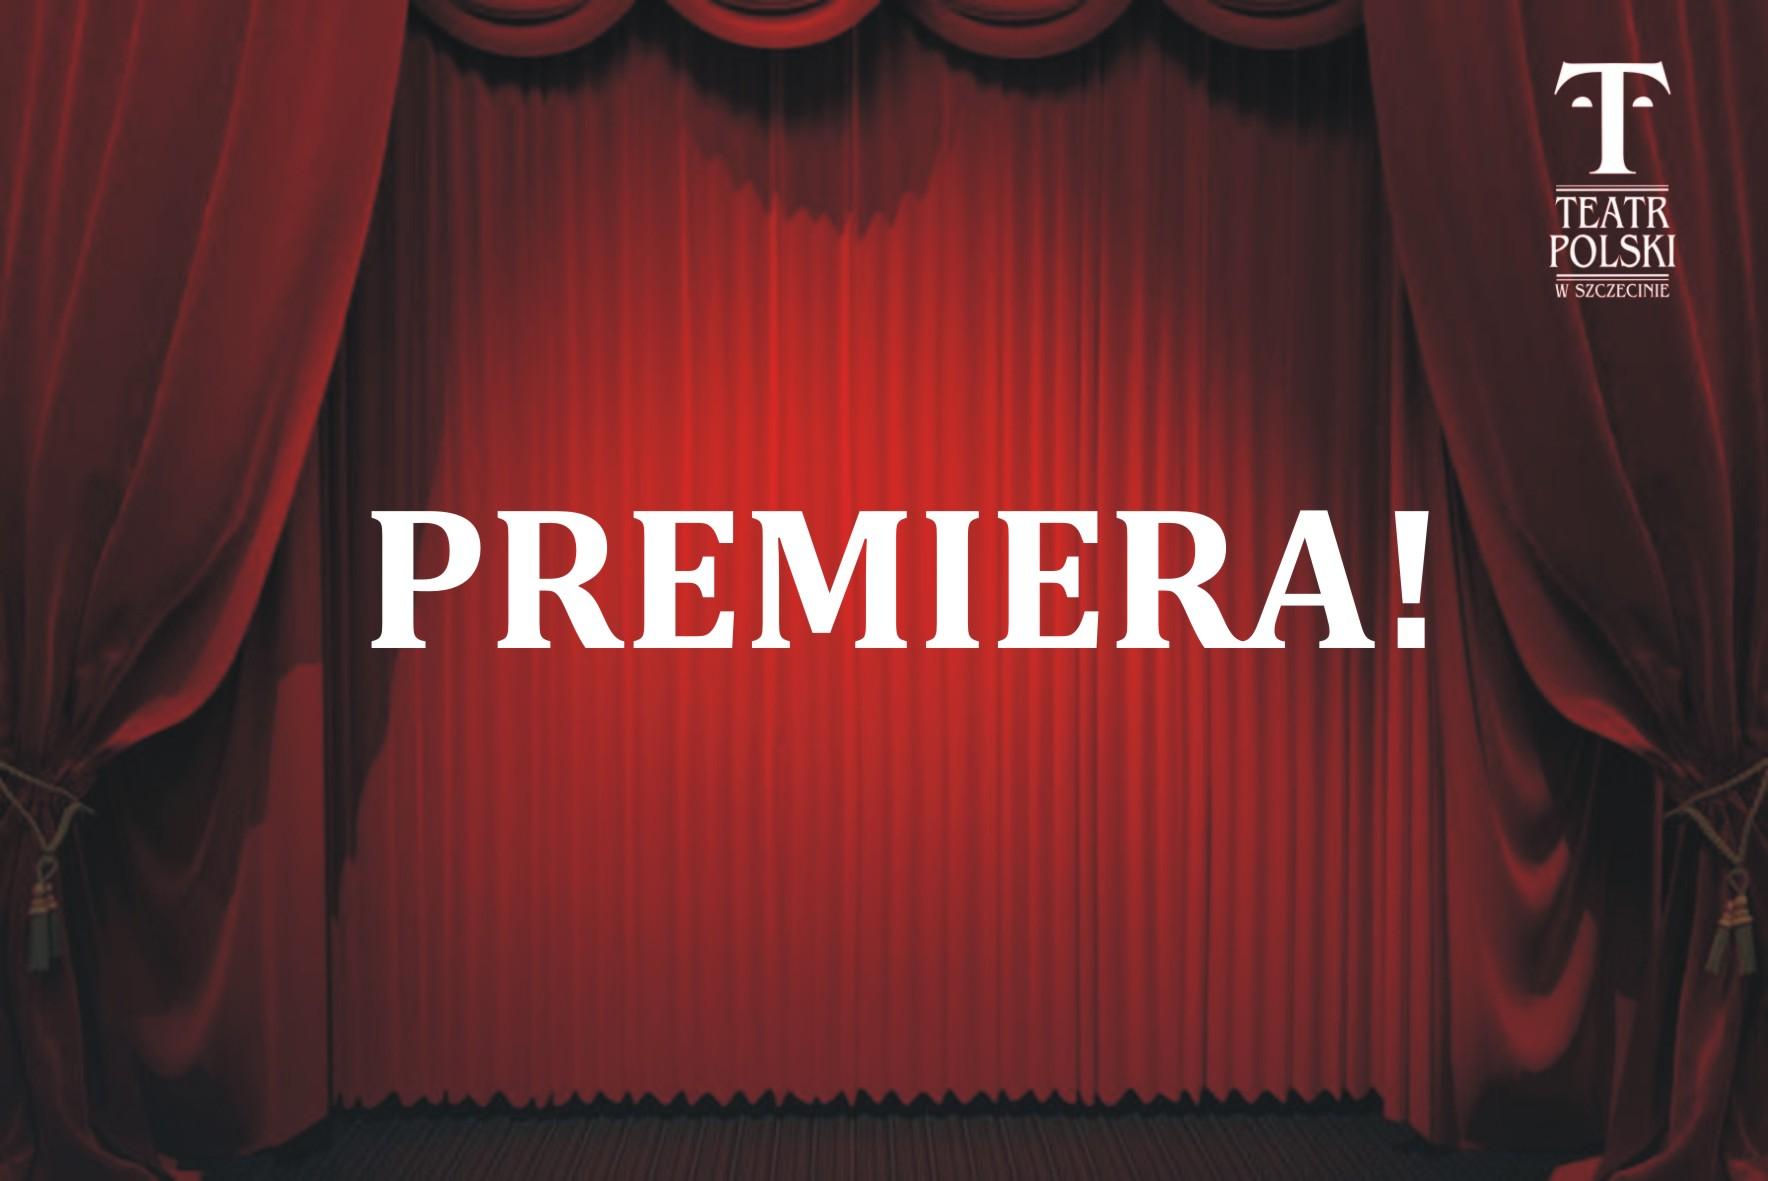 Musical Show - Premiera